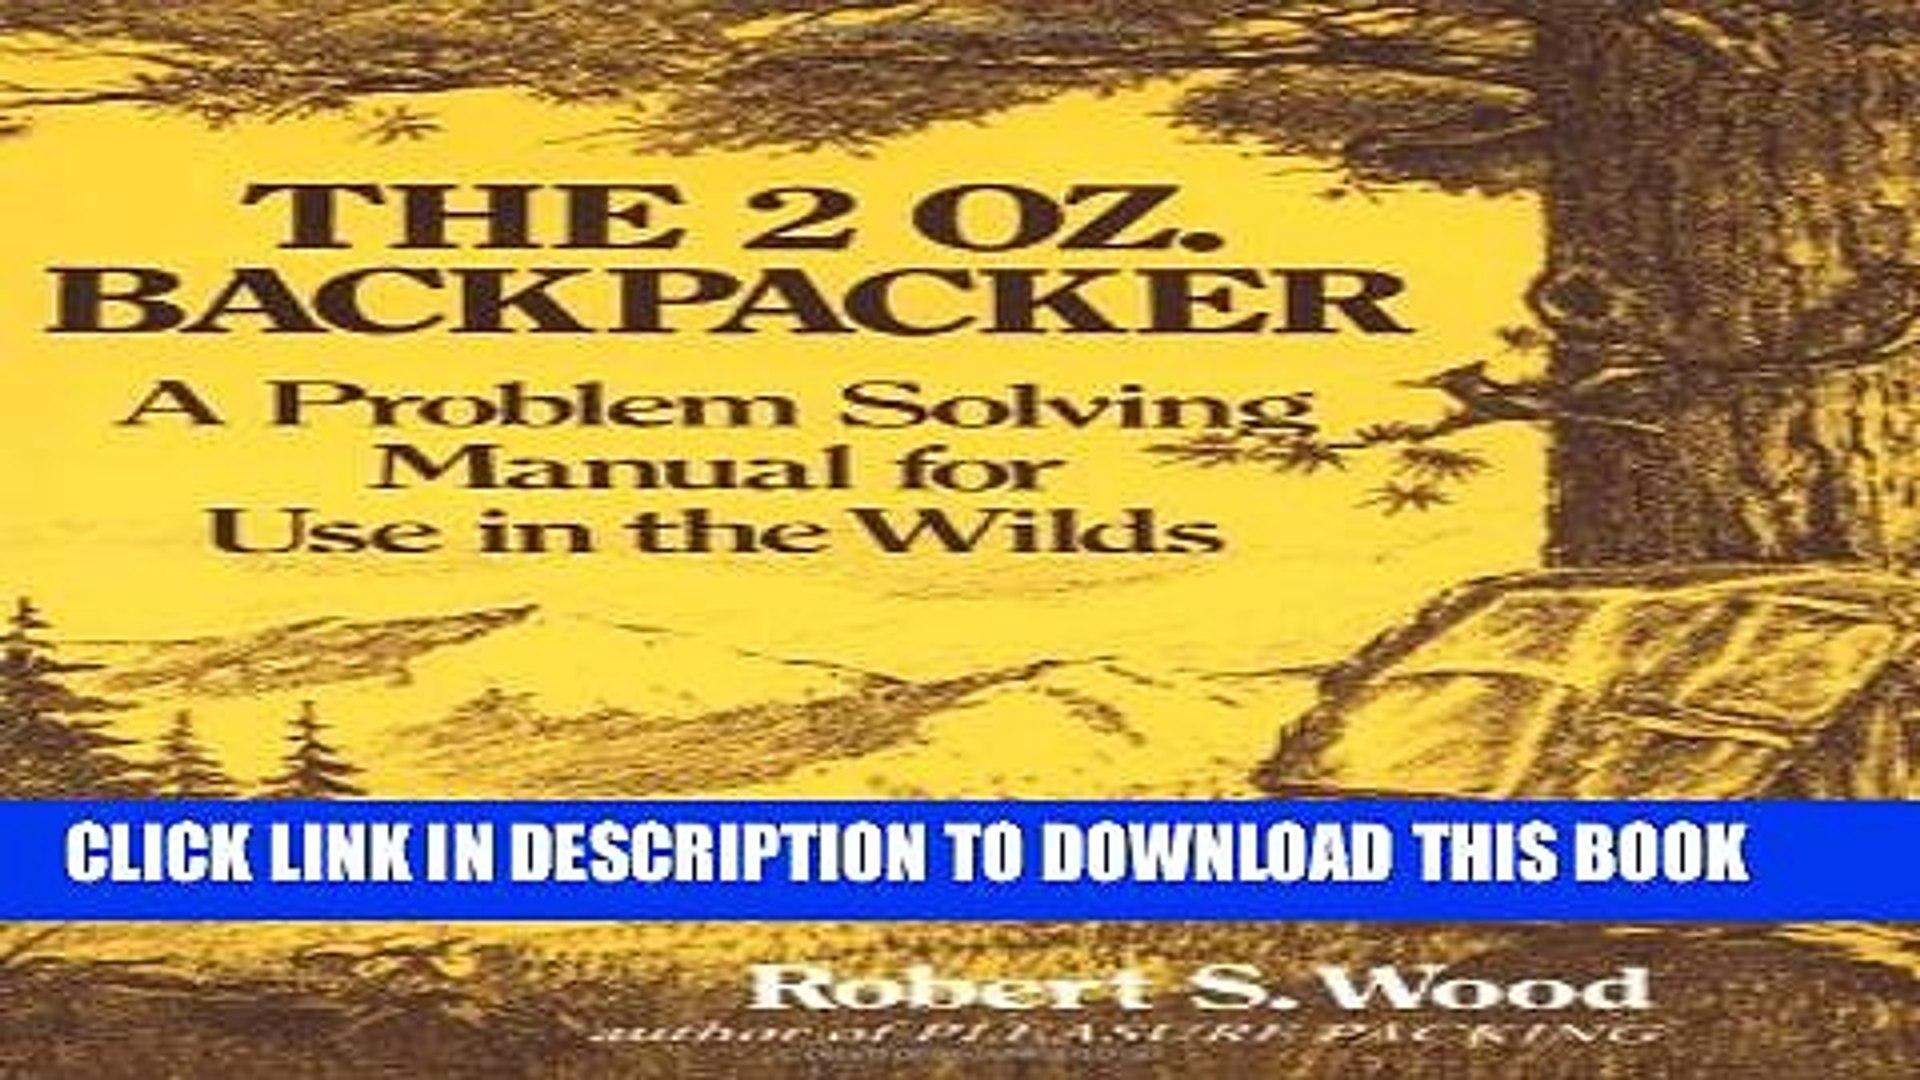 The 2 Oz. Backpacker